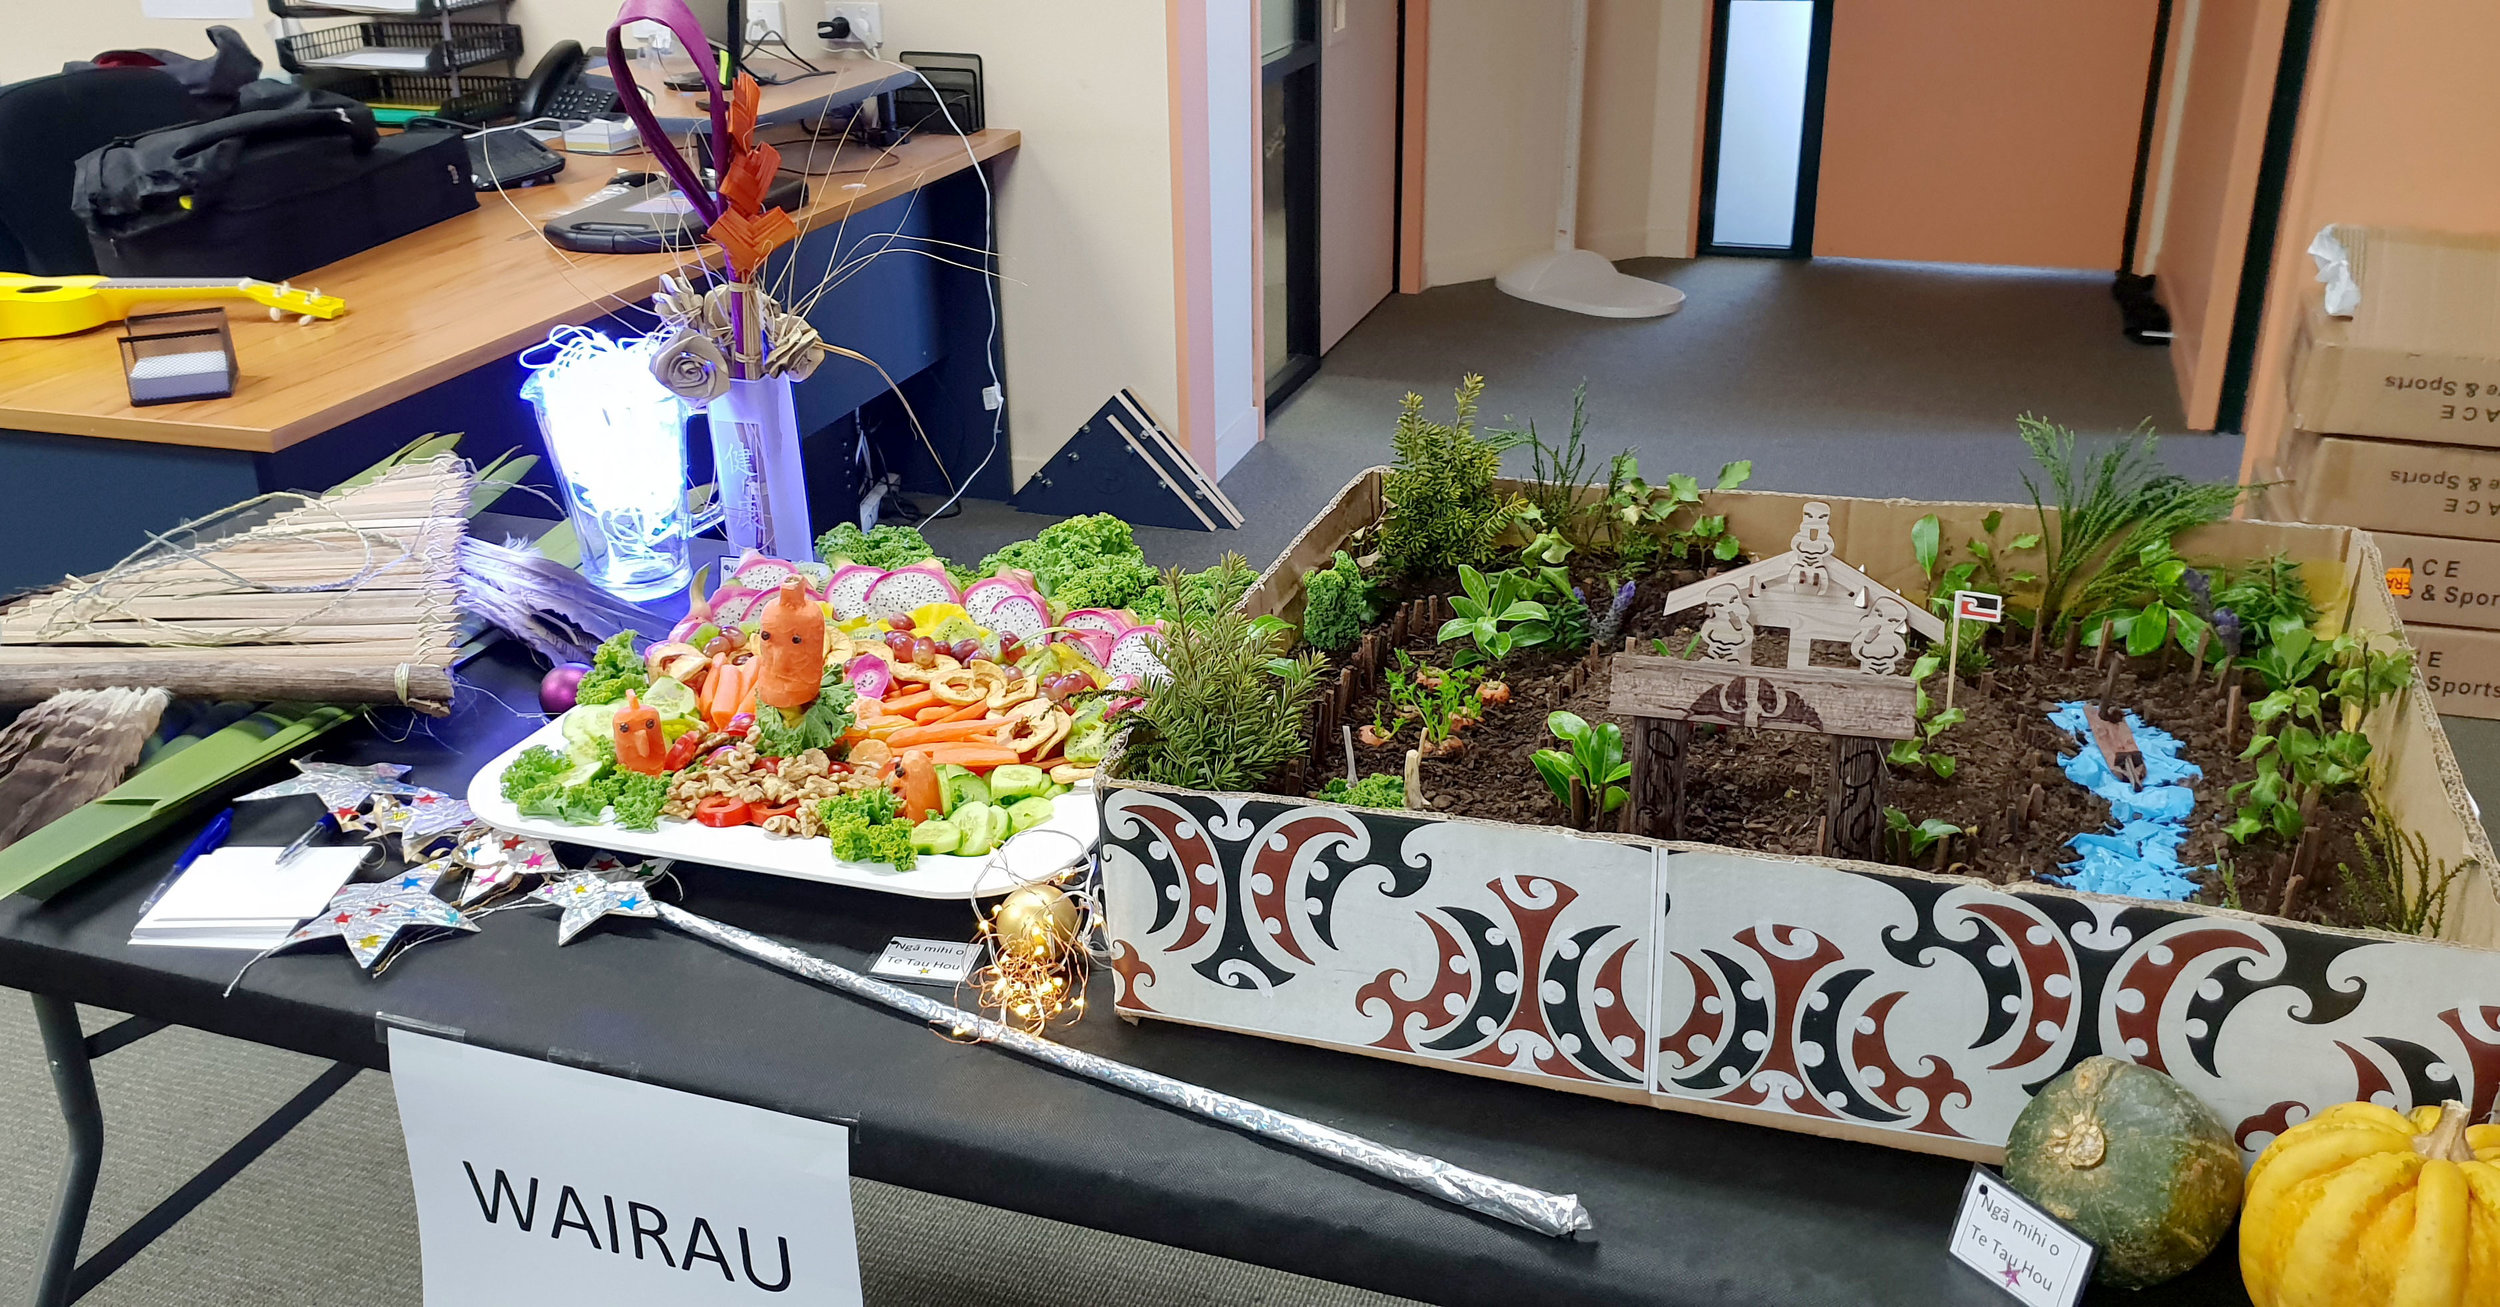 Wairau, third in miniature garden